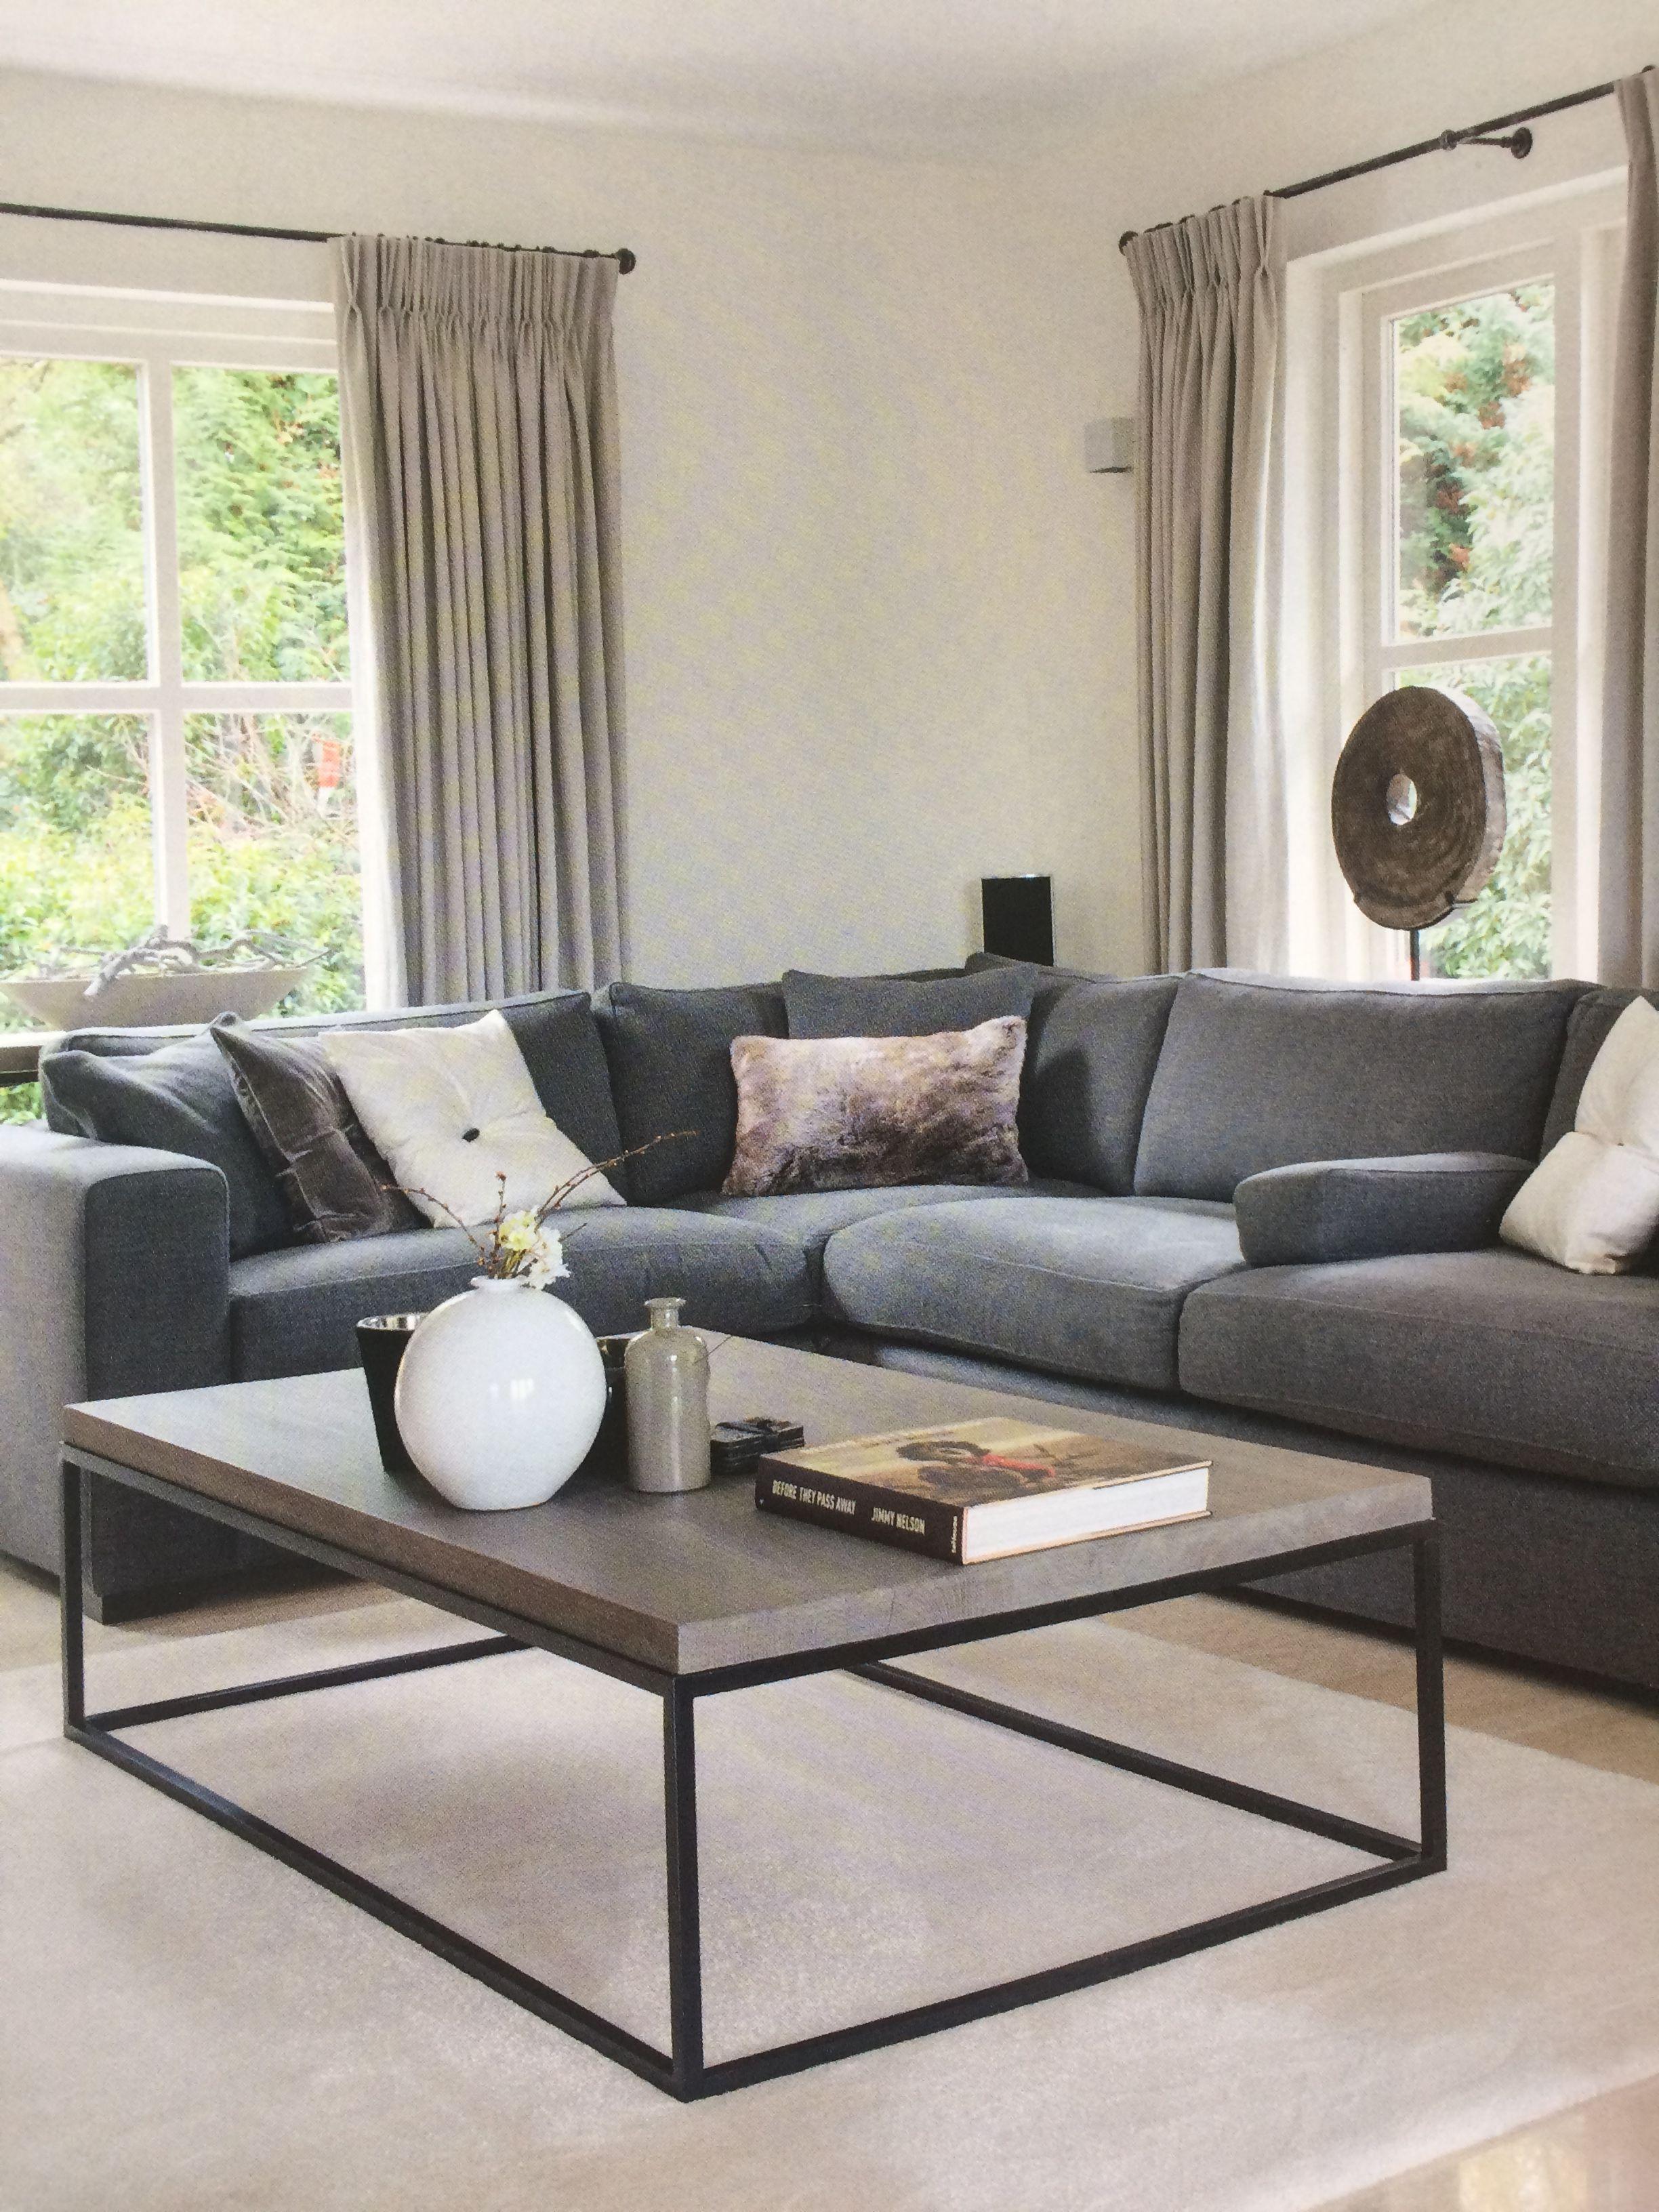 keijserenco kleine woonkamers woonkamer modern woongedeelte thuis woonkamer woonkamerdesign woonkamer decor